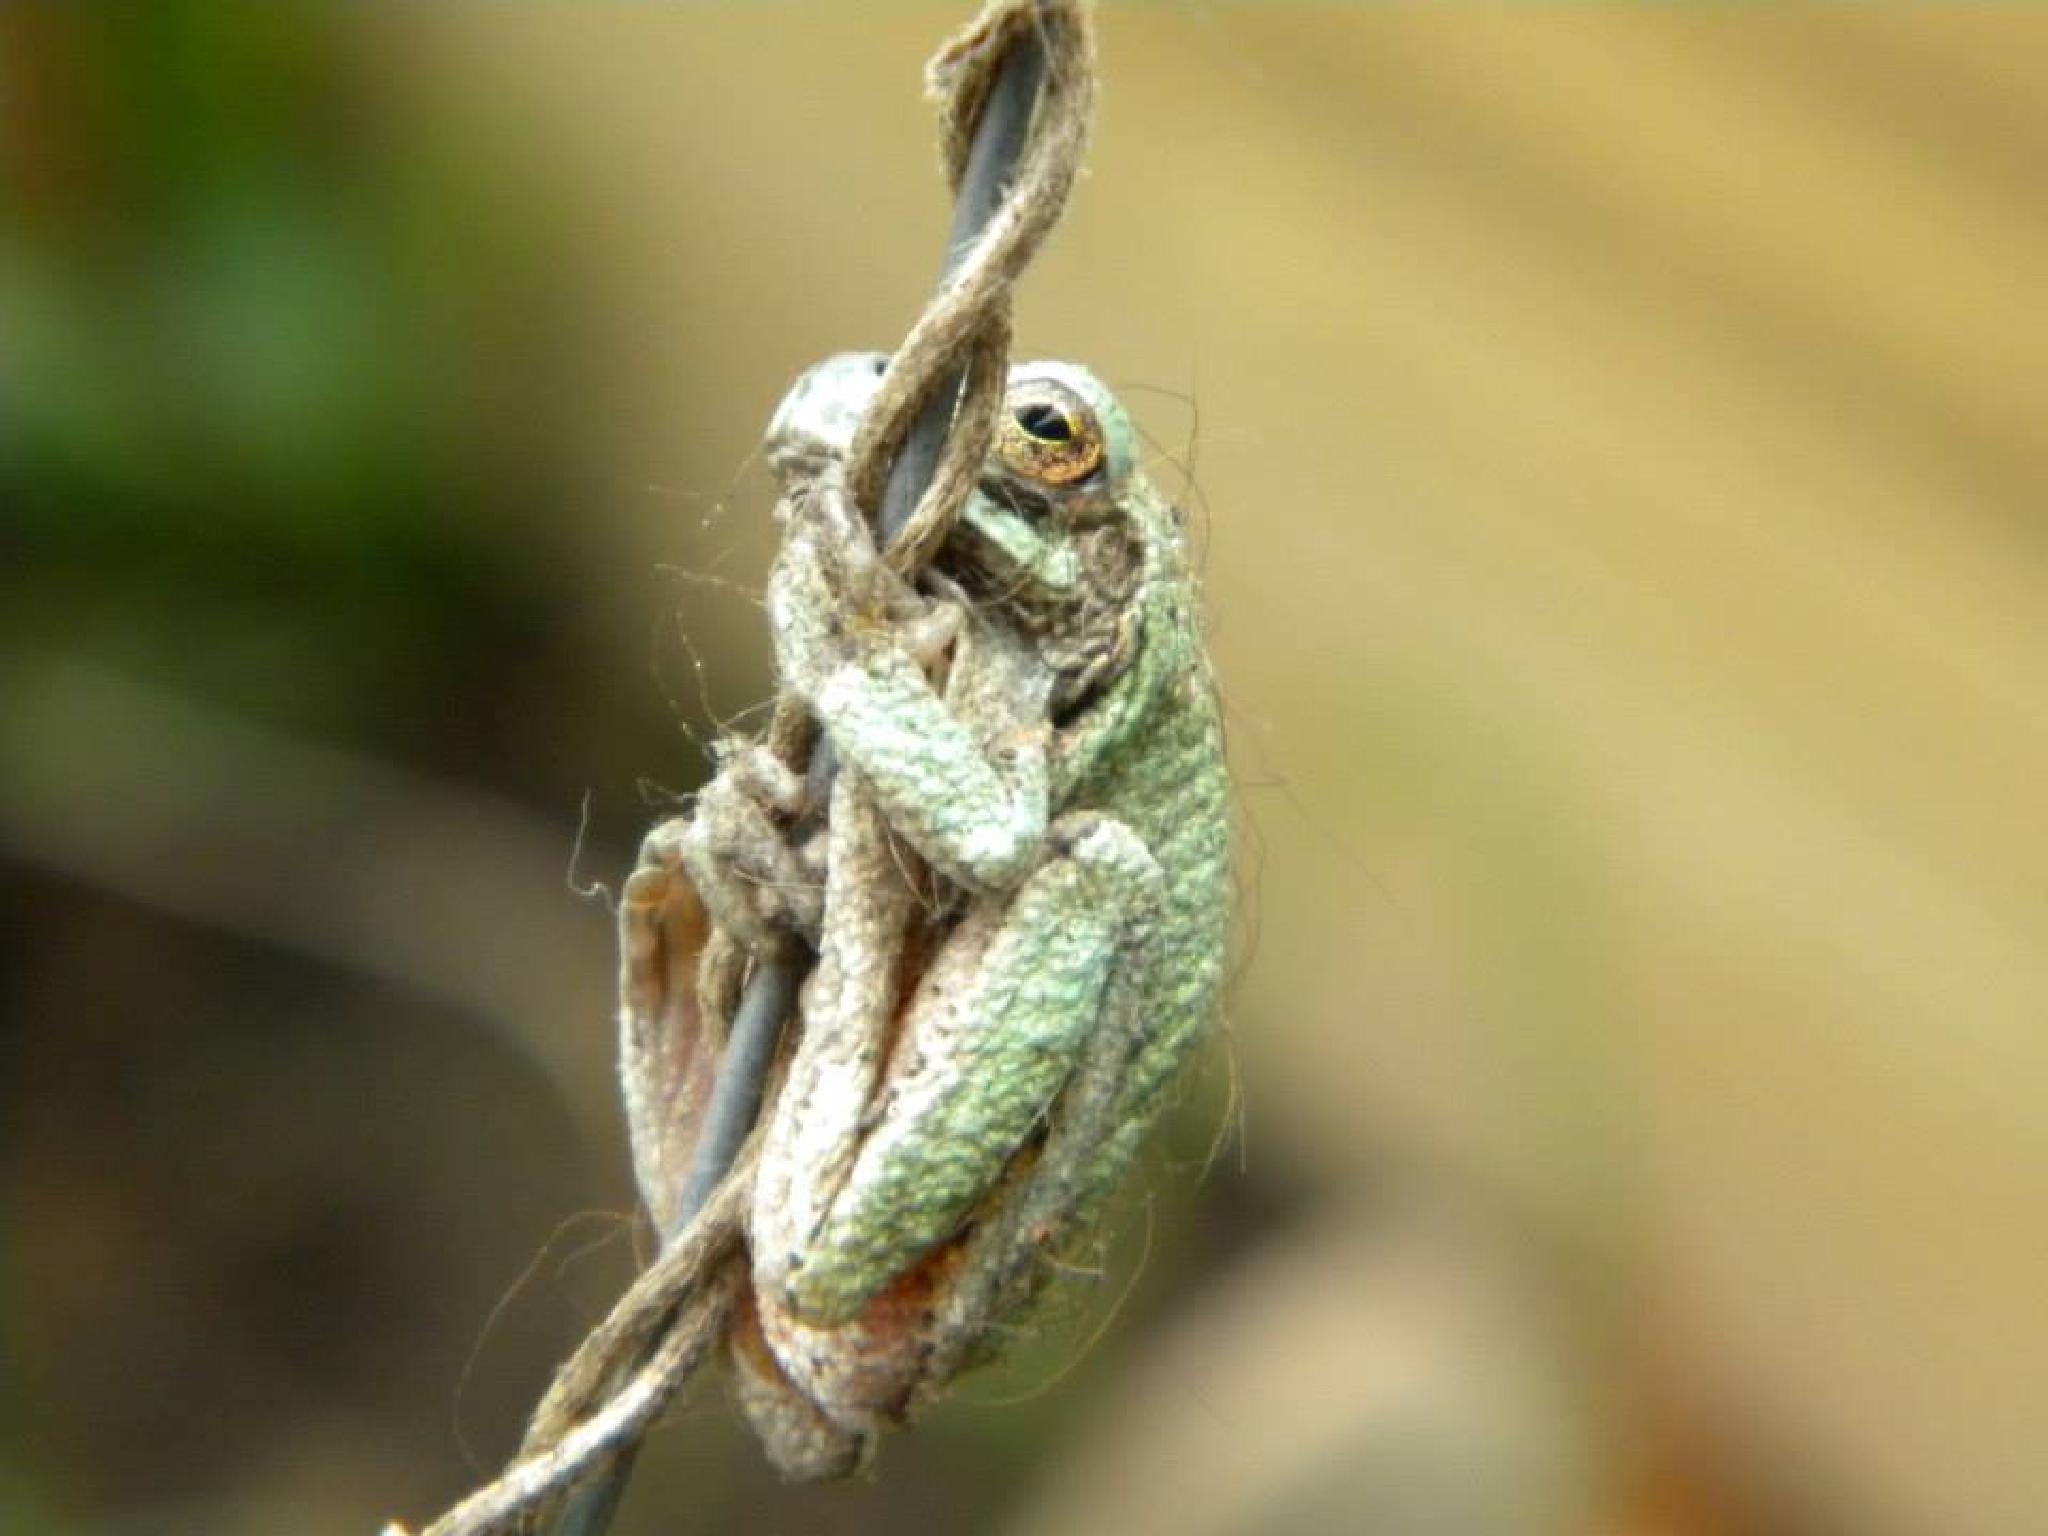 Hairy Little Frog by Trish Kraemer